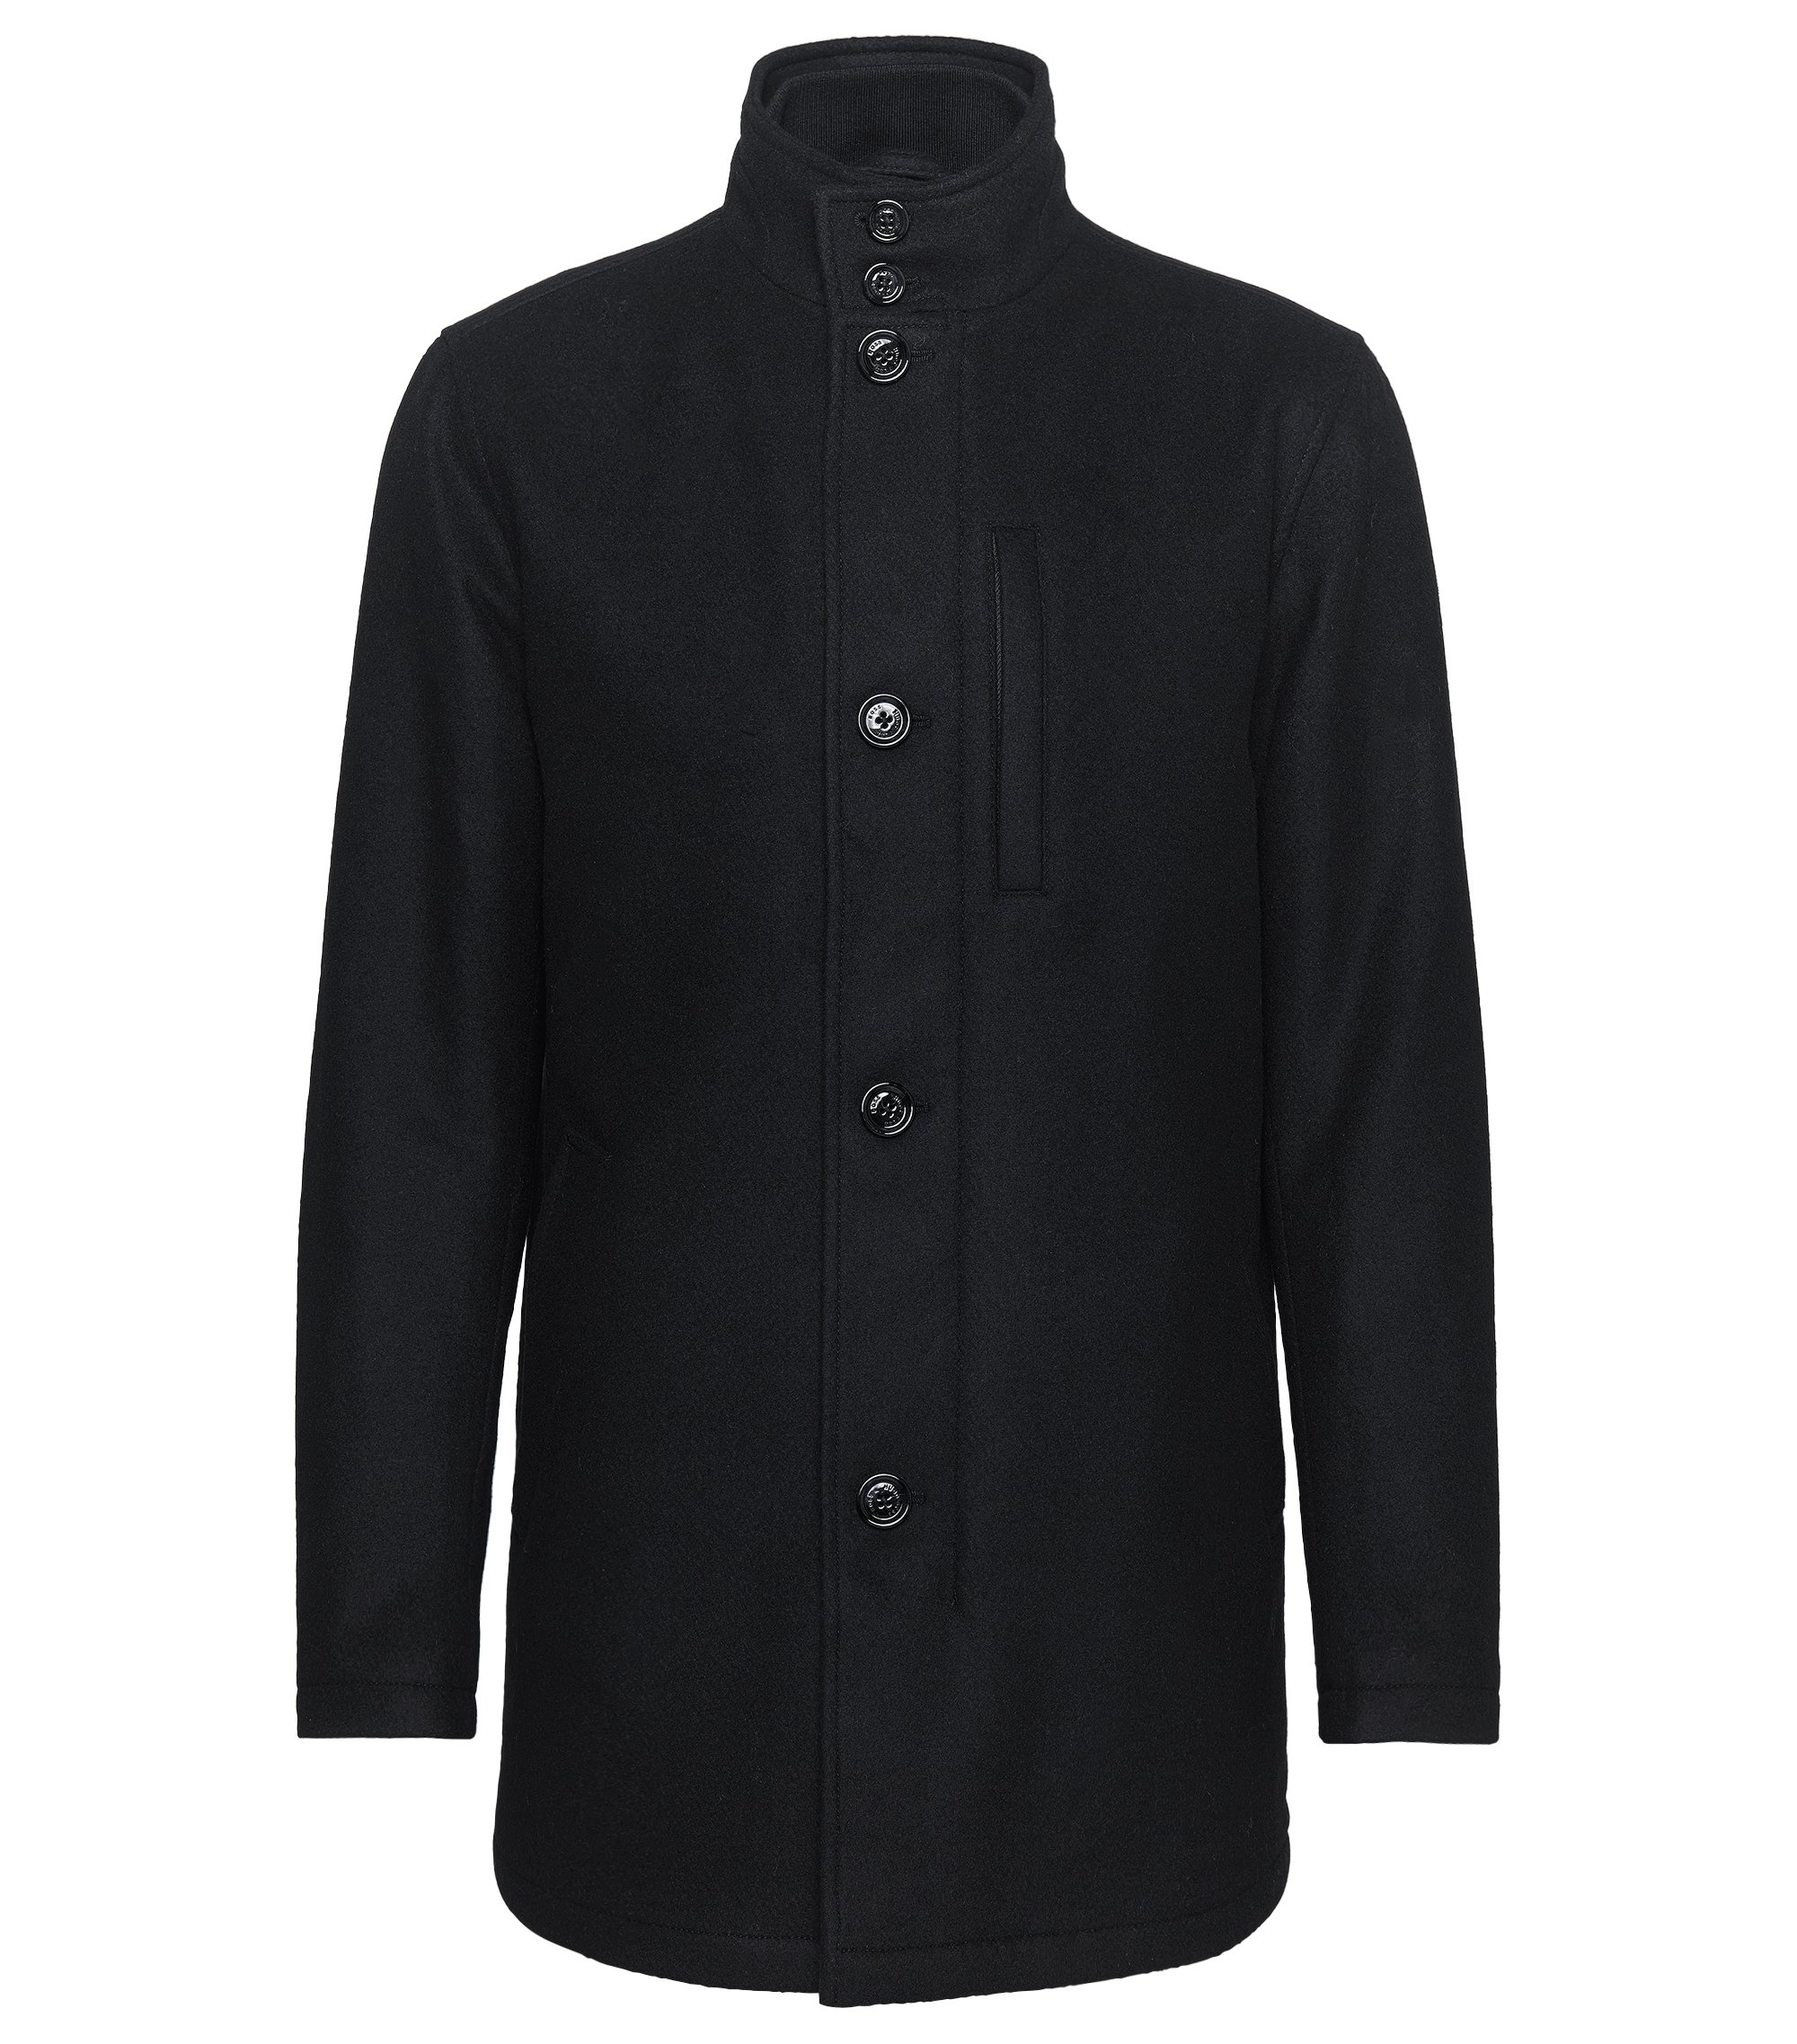 Wool Blend Jacket | Camron, Black